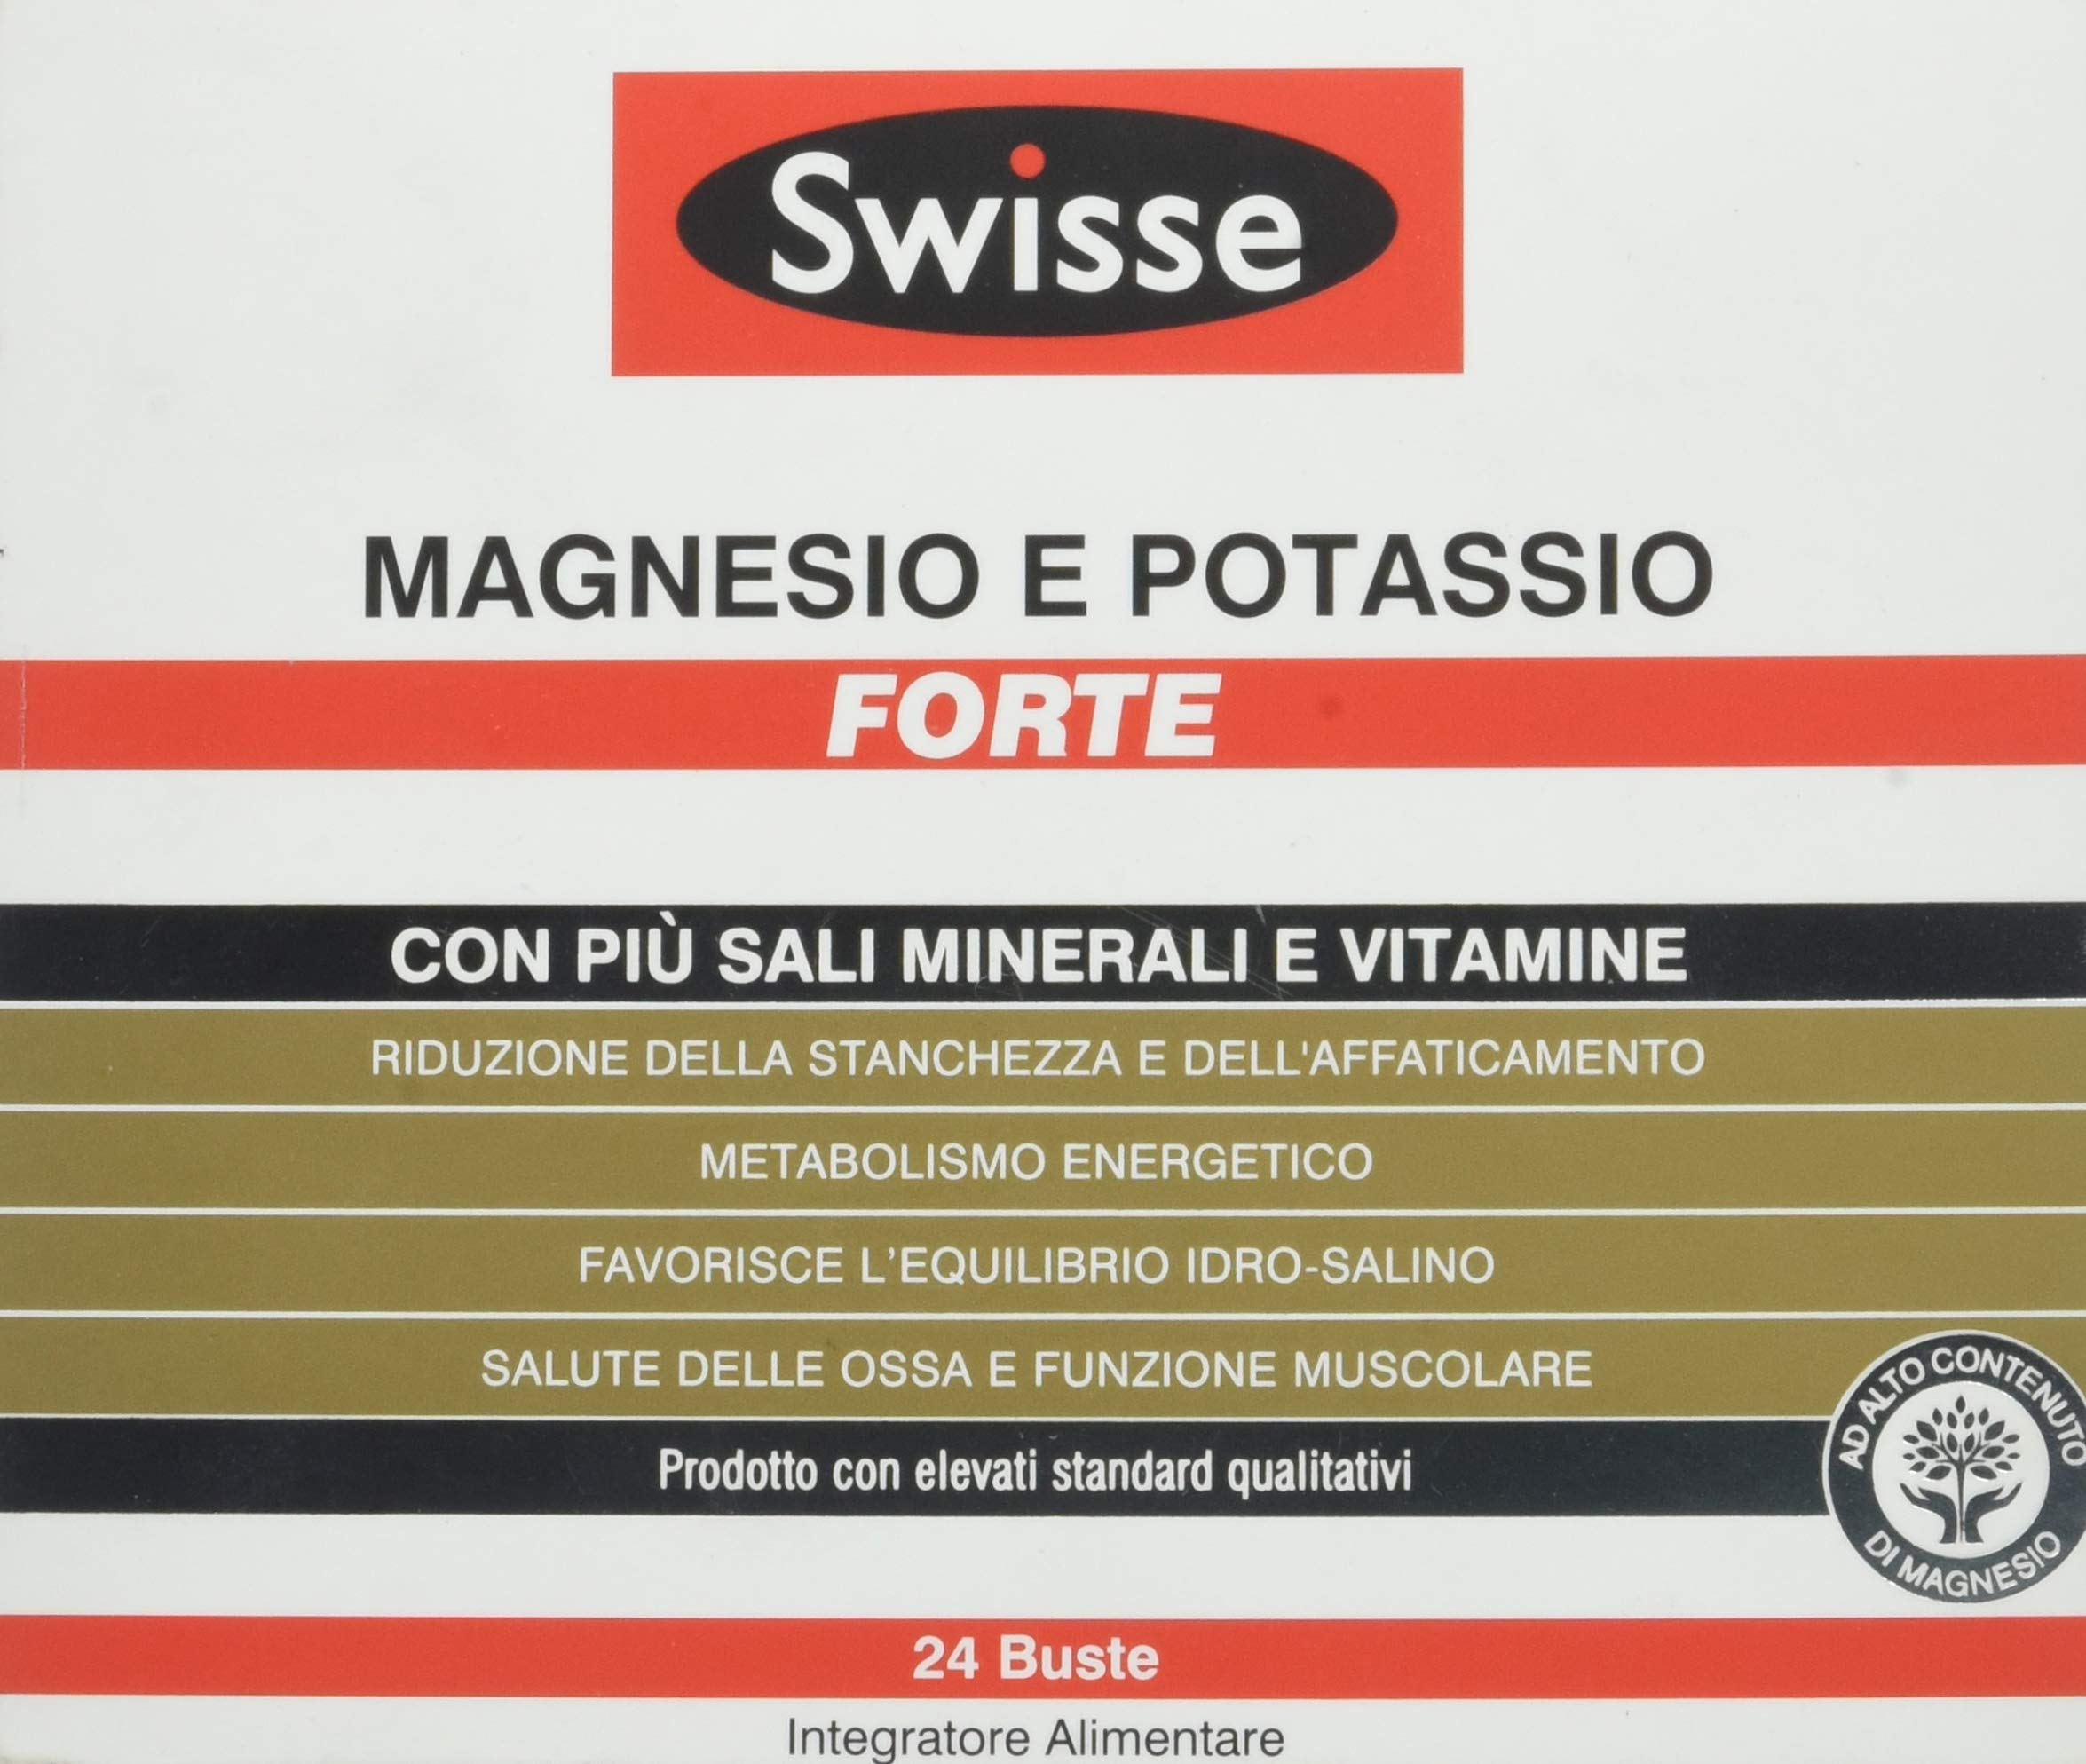 Swisse Magnesio e Potassio Forte, Integrazione di Sali minerali, 24 Bustine 1 spesavip